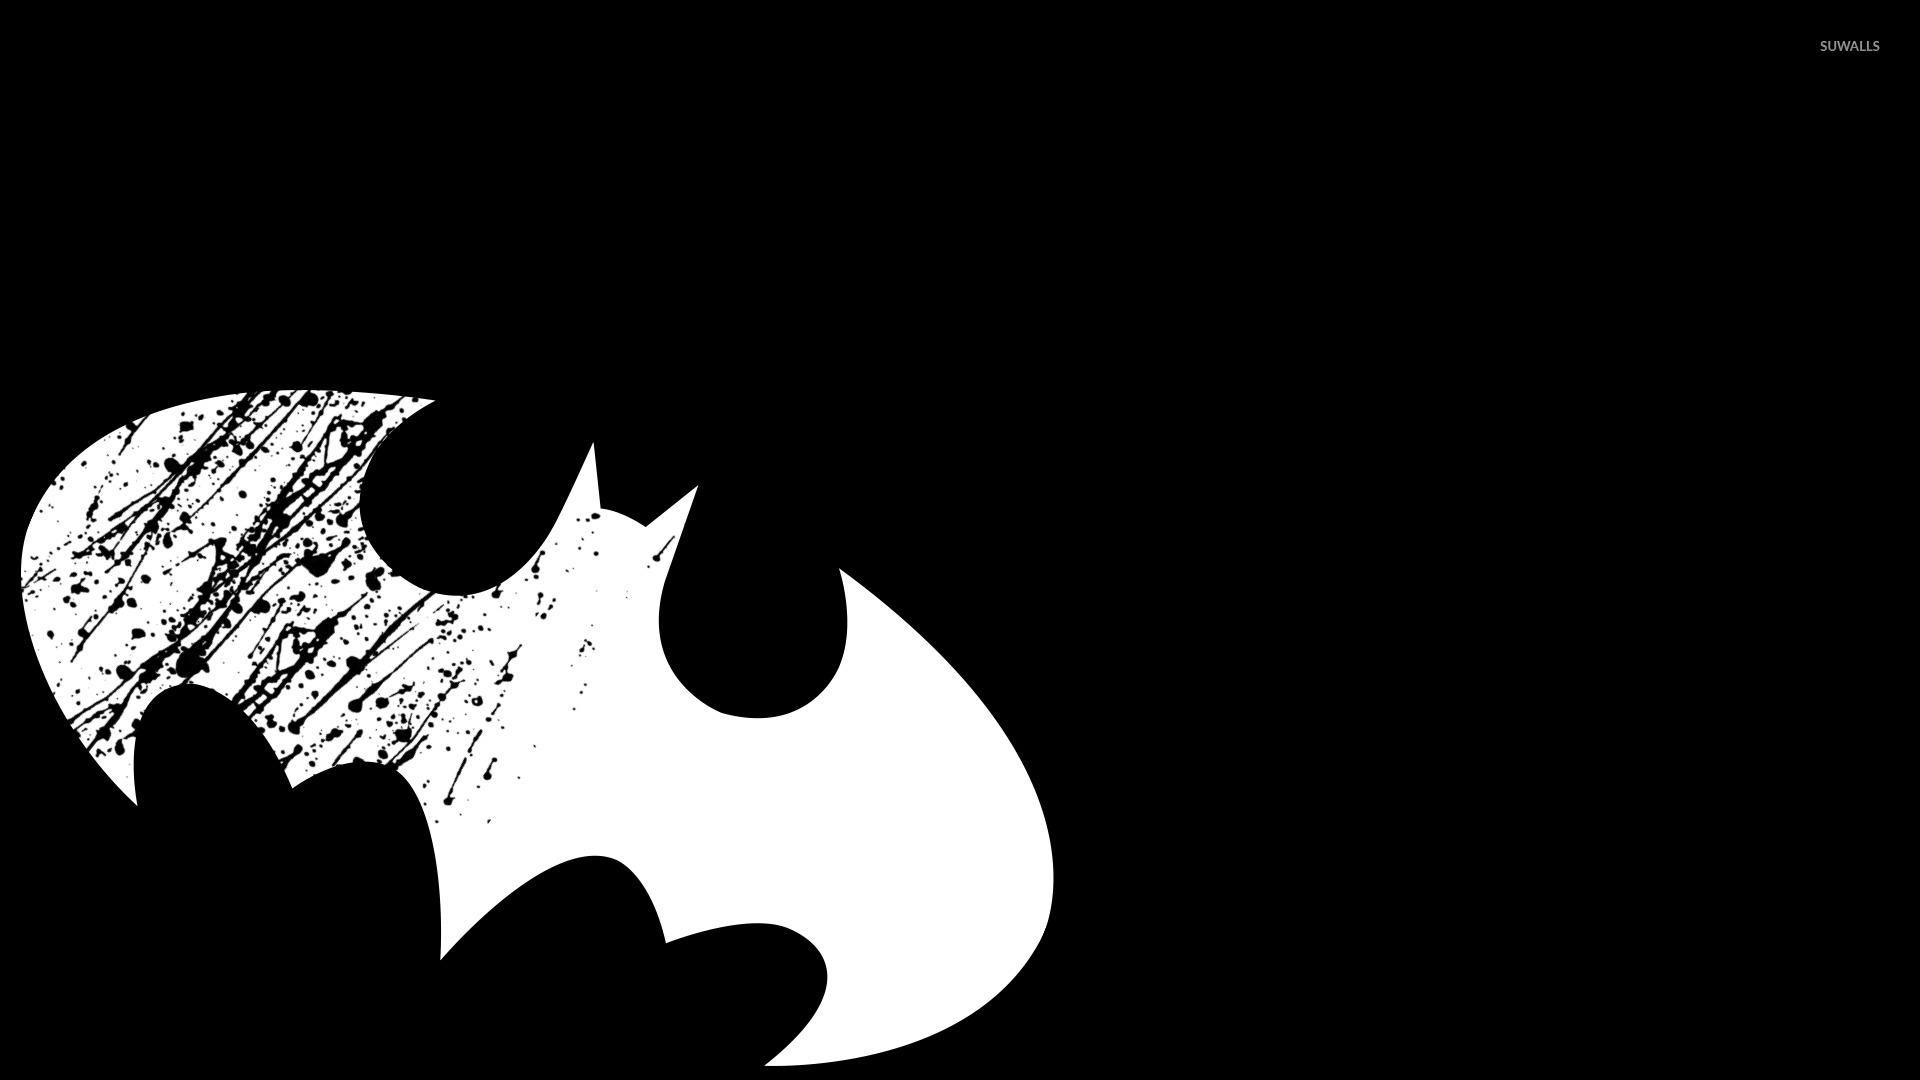 Batman 1920x1080 Wallpaper Posted By Sarah Thompson